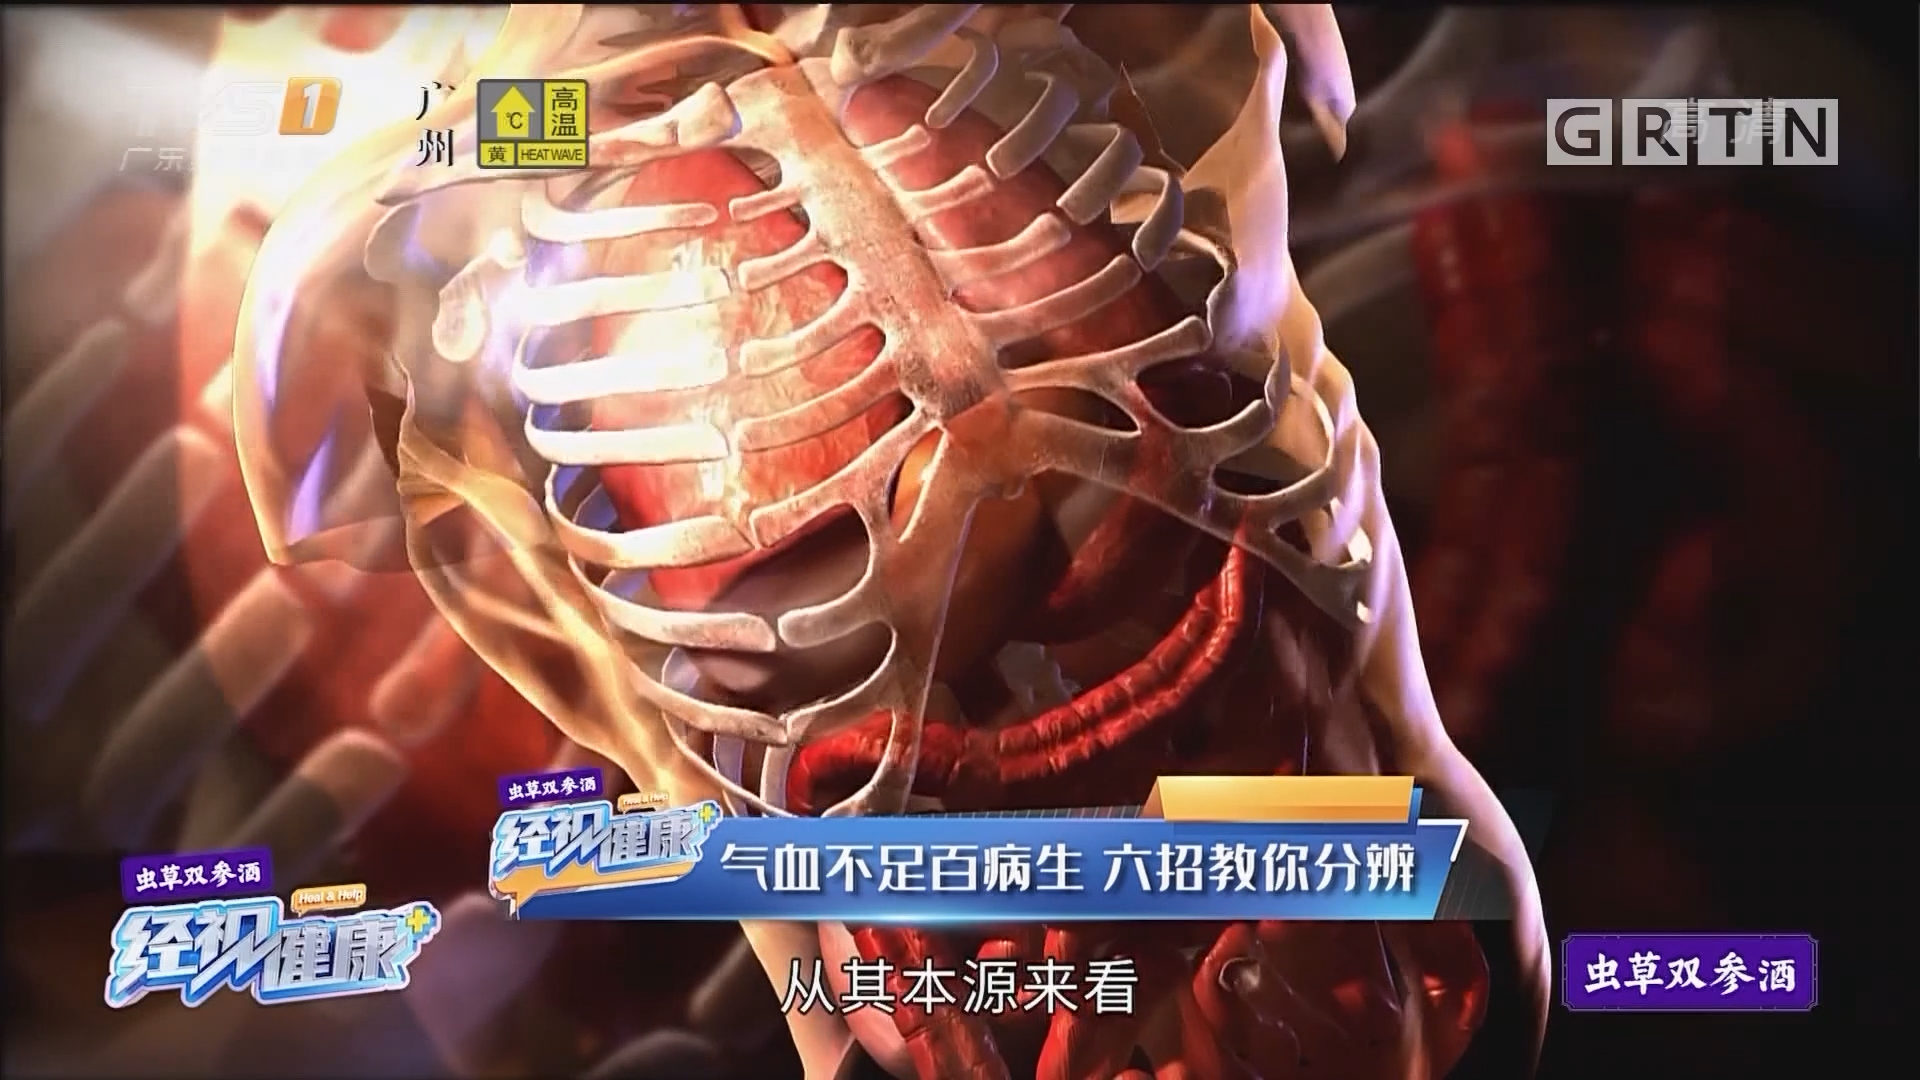 [HD][2019-08-21]经视健康+:气血不足百病生 六招教你分辨